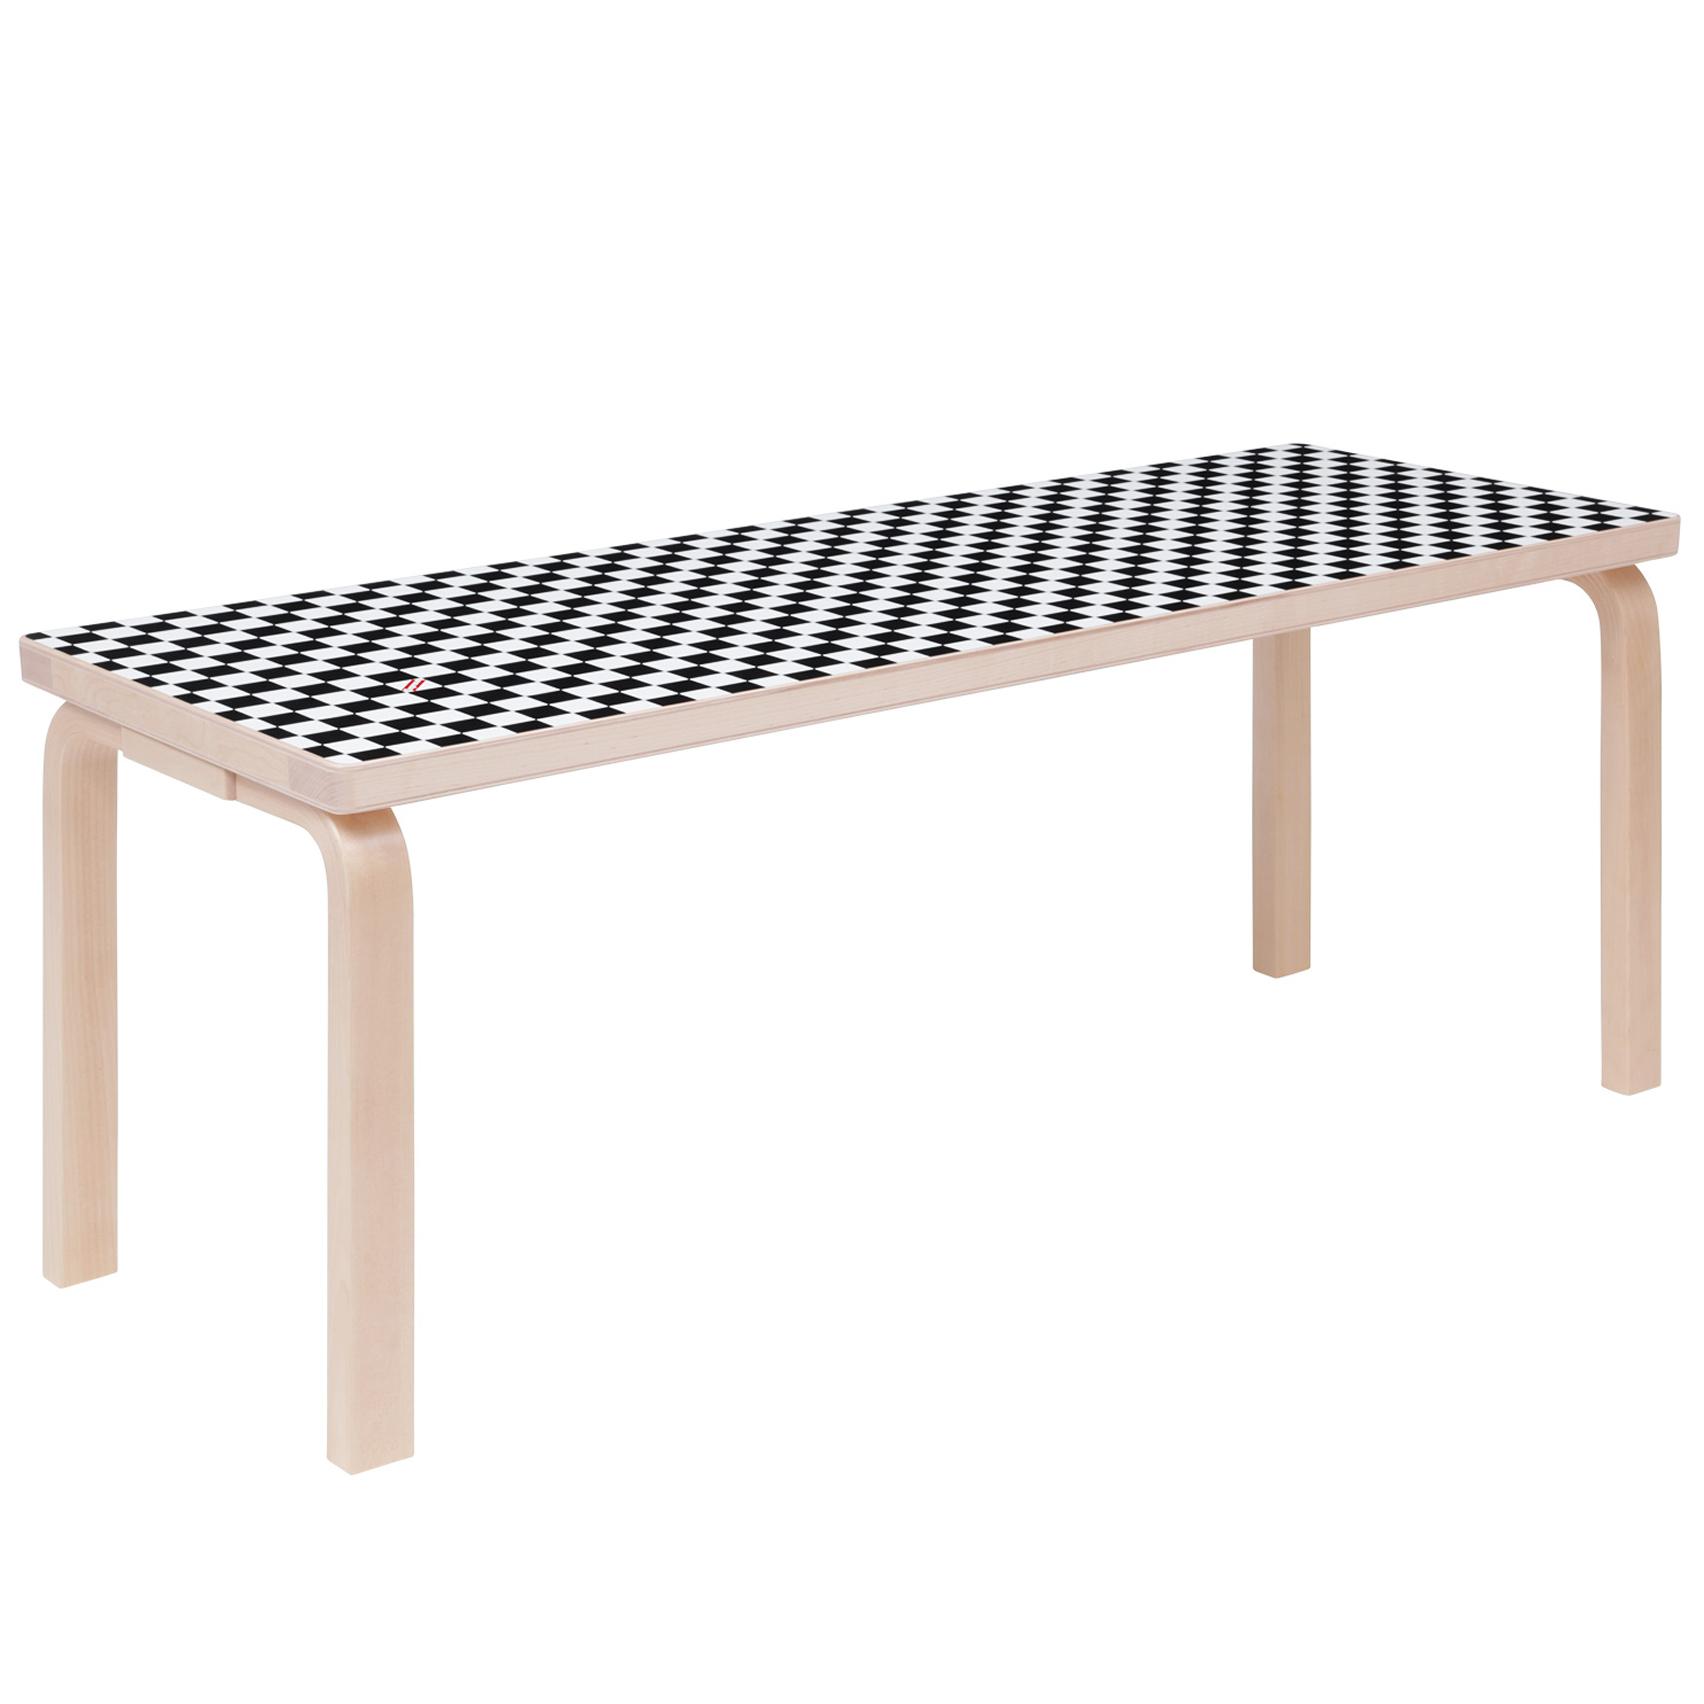 Supreme unveils checkerboard edition of alvar aaltos iconic stool 60